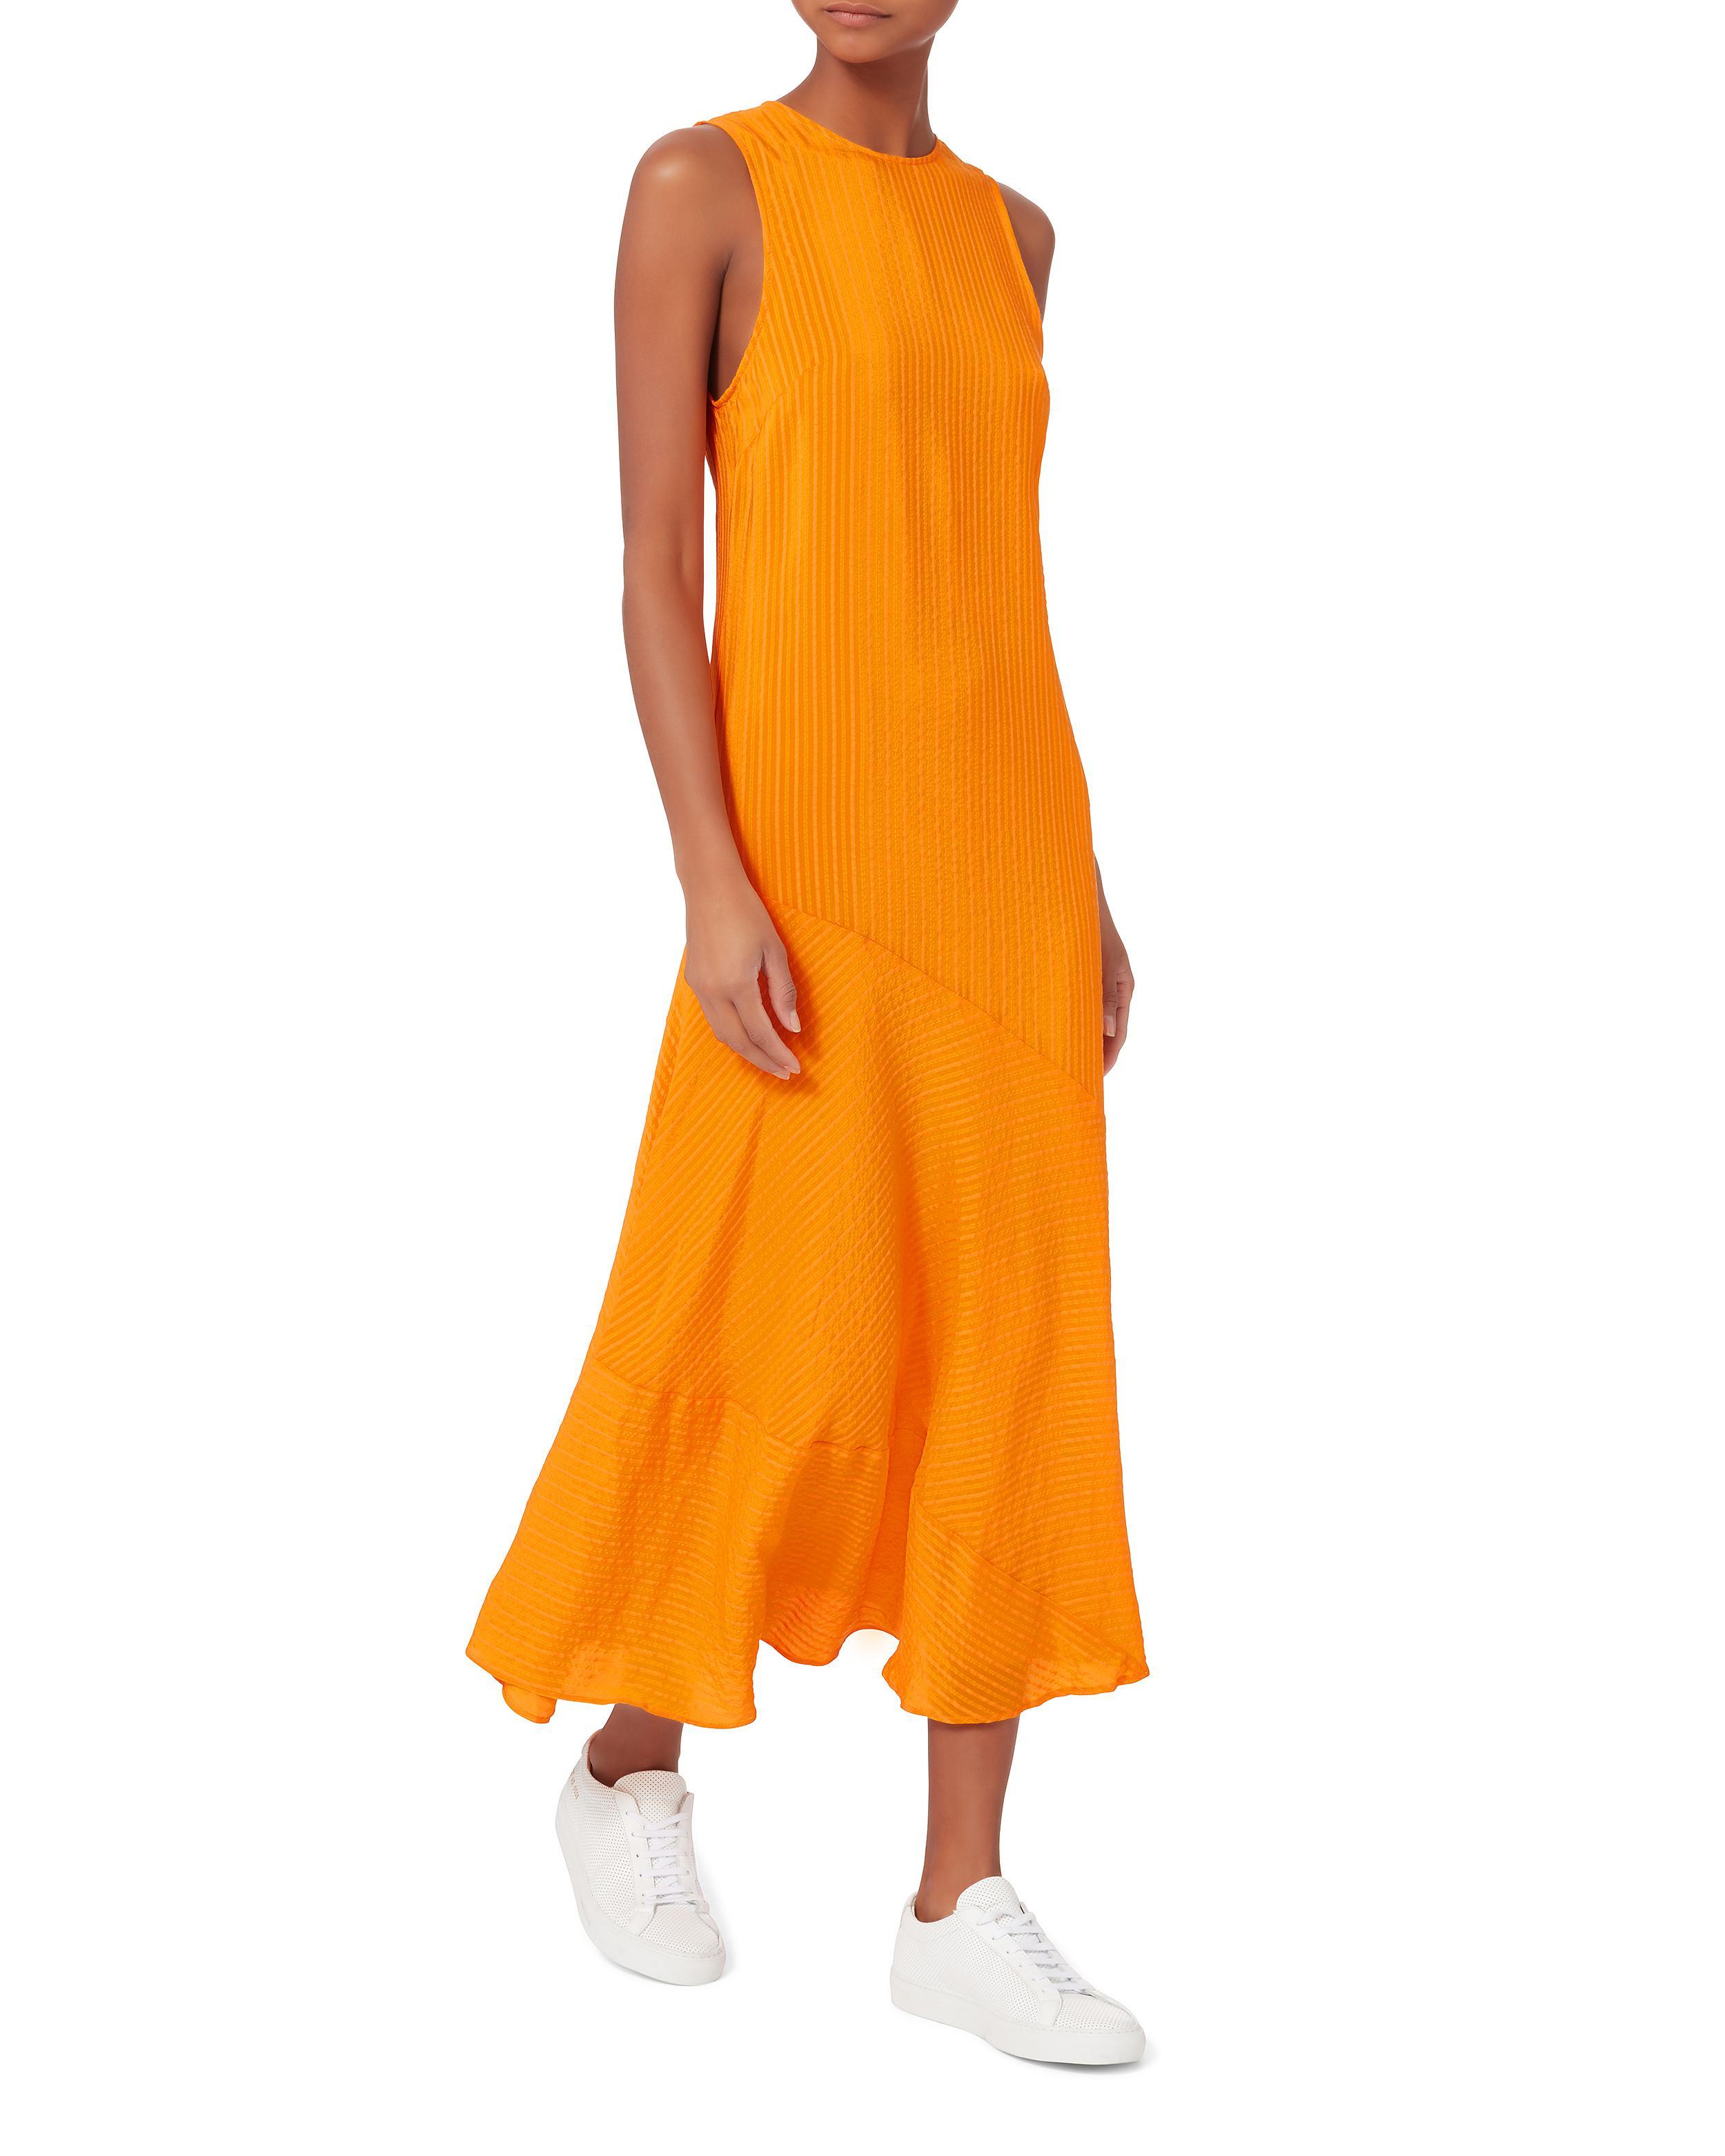 565b9d7d Ganni Wilkie Seersucker Turmeric Dress in Orange - Lyst